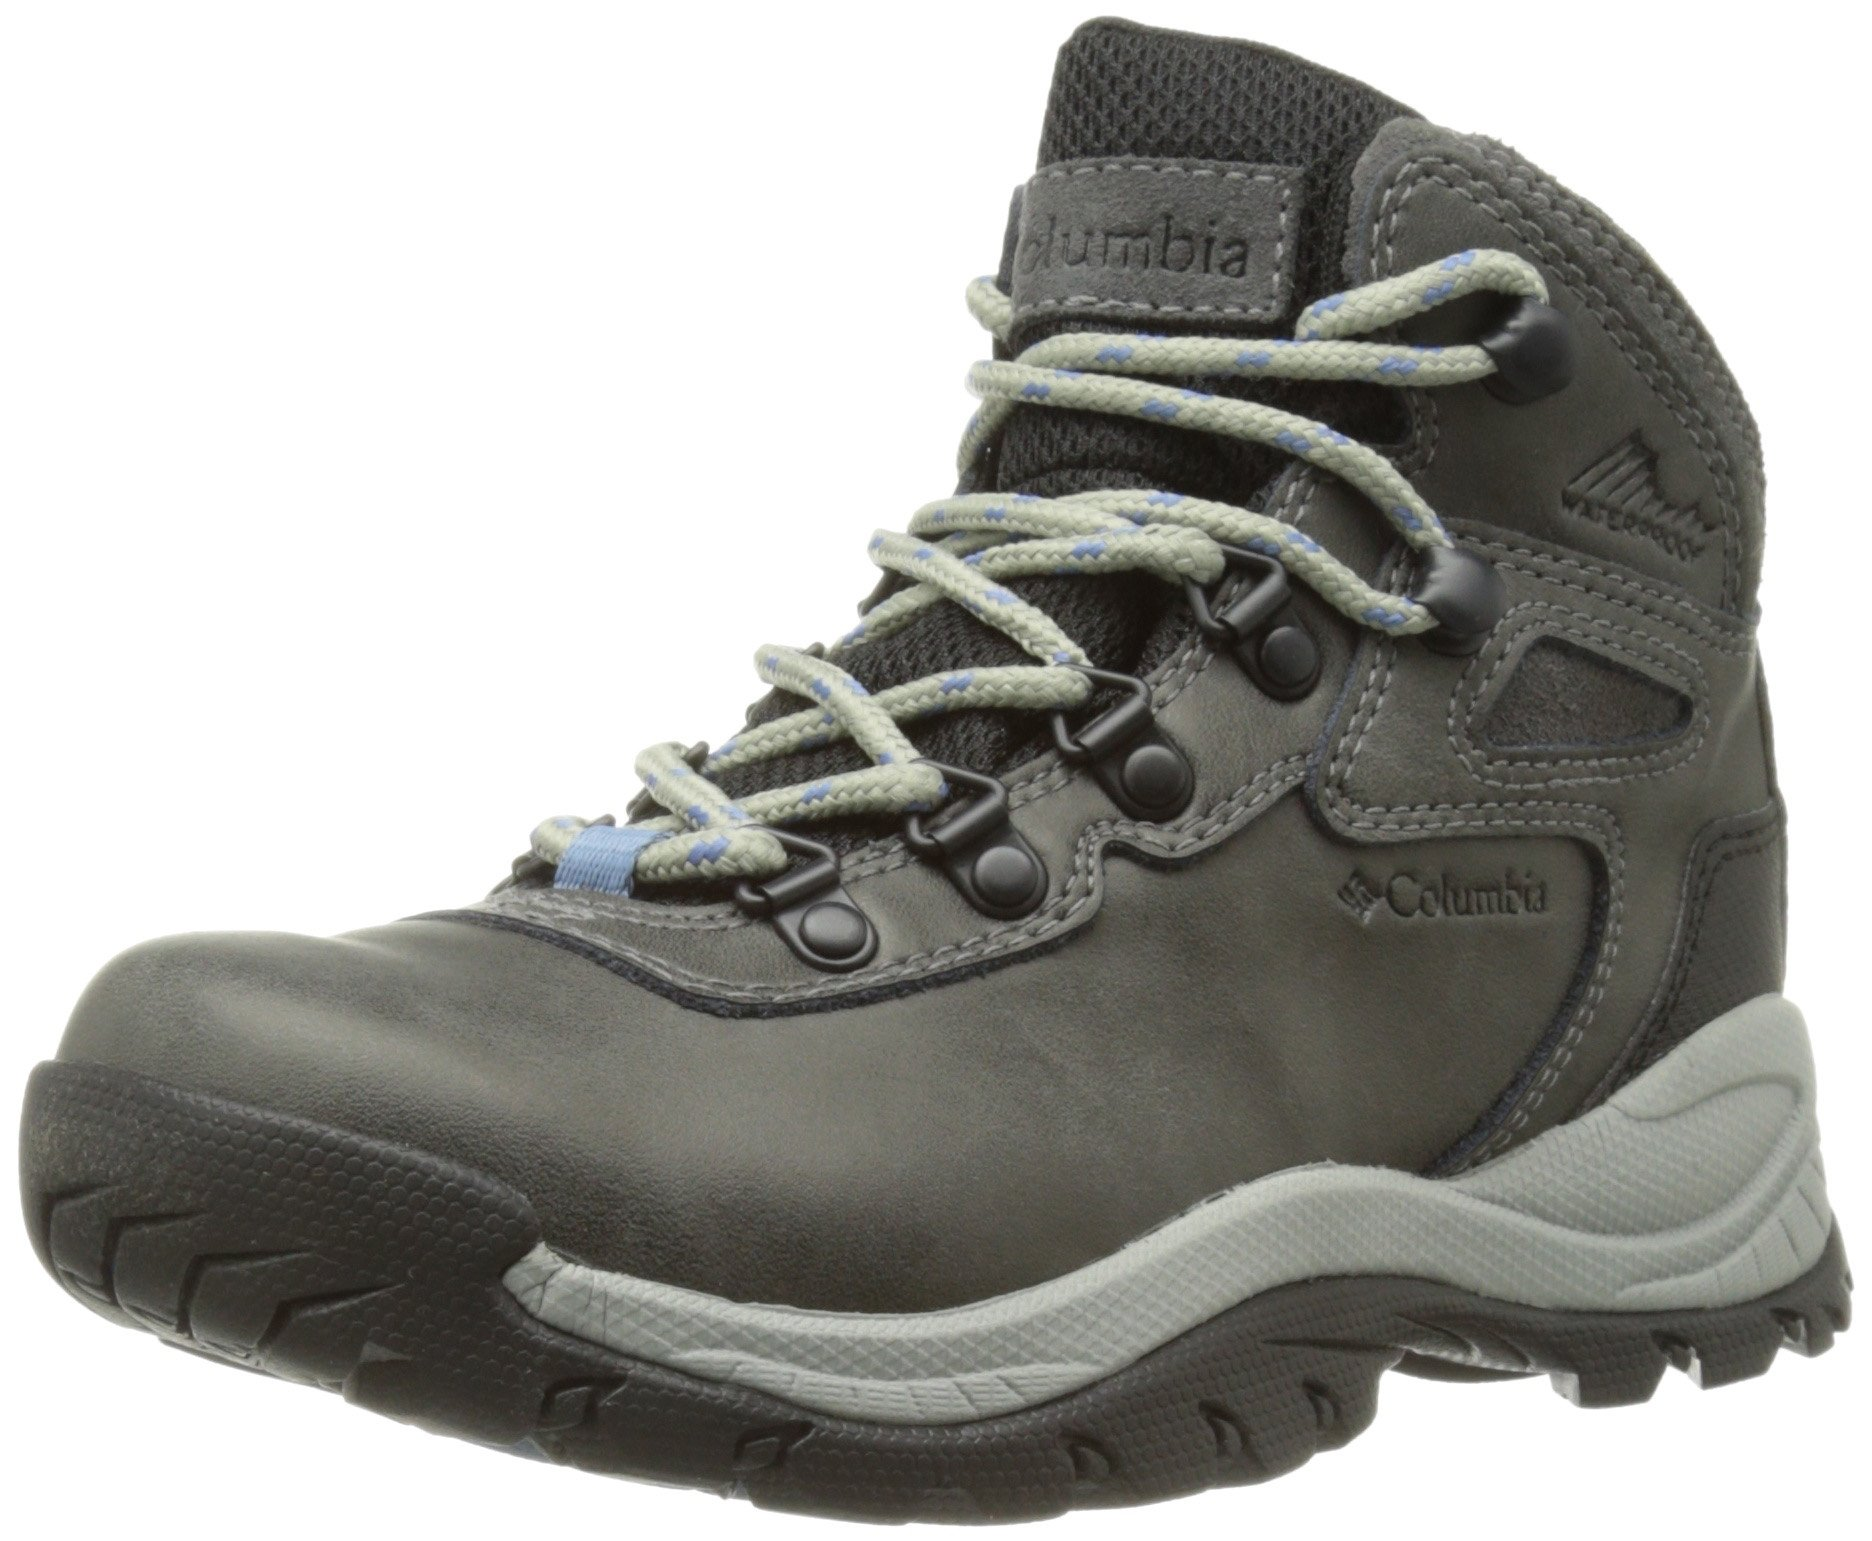 Columbia Women's Newton Ridge Plus Hiking Boot, Quarry/Cool Wave, 10 M US